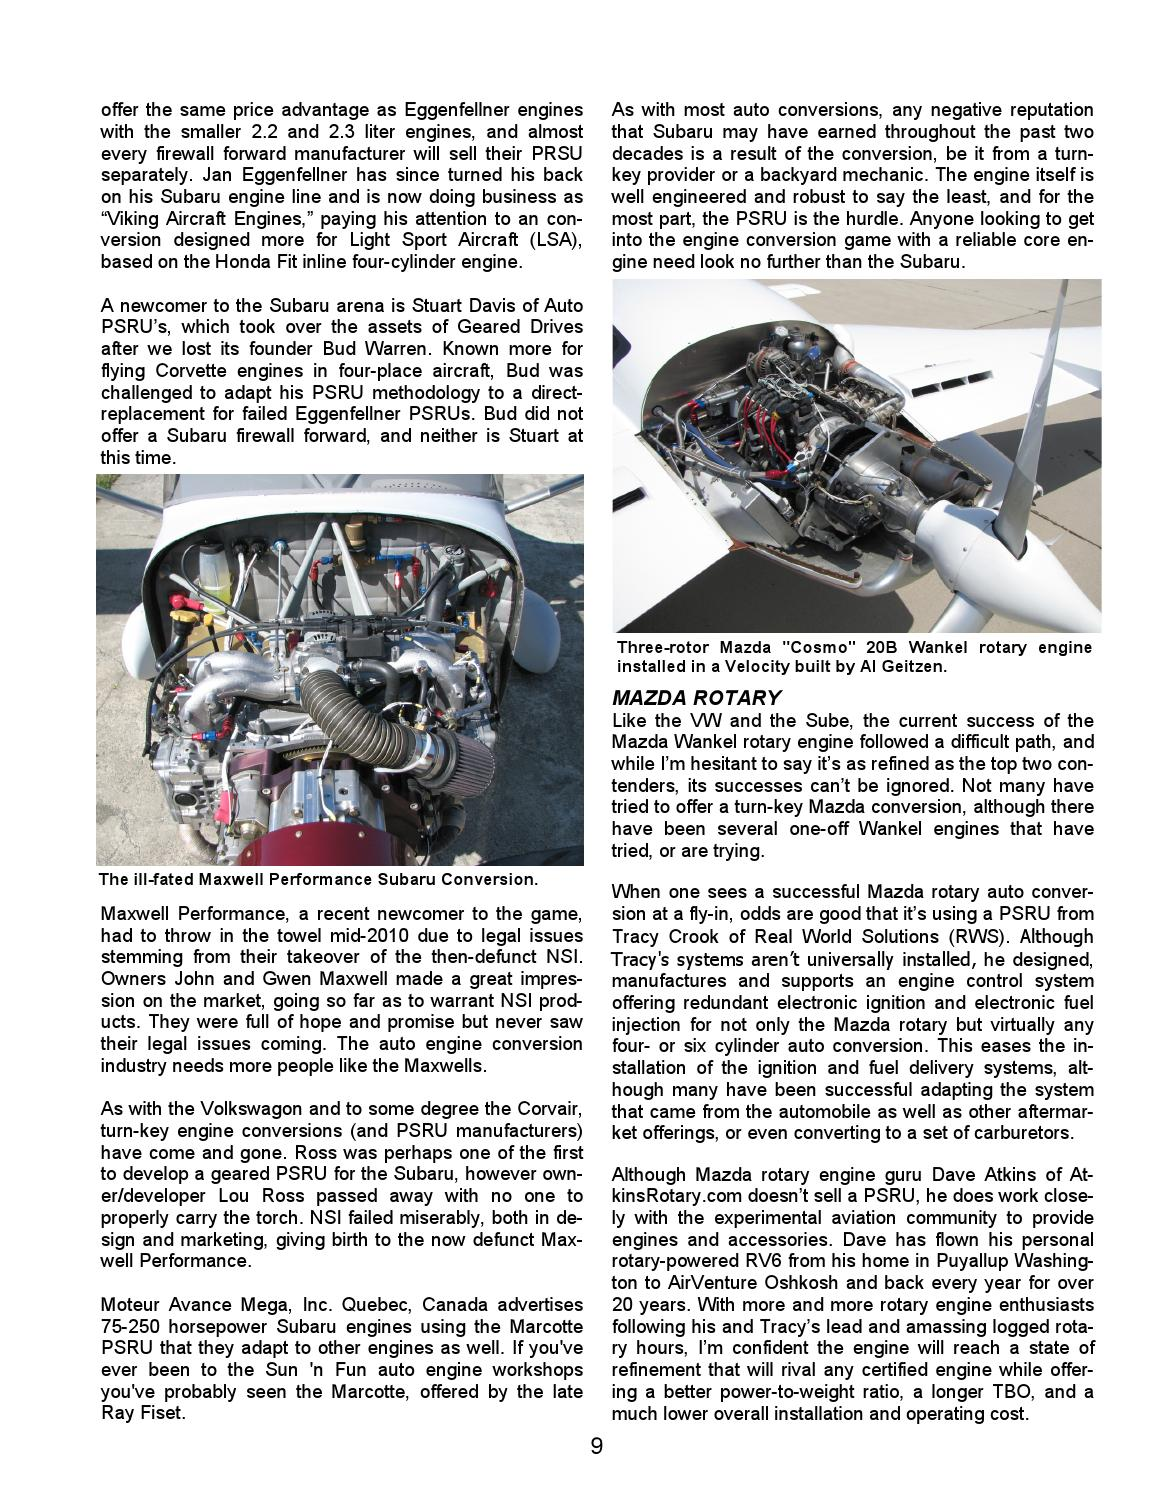 Alternative Engines Volume 4 preview by Editor, Patrick Panzera - issuu